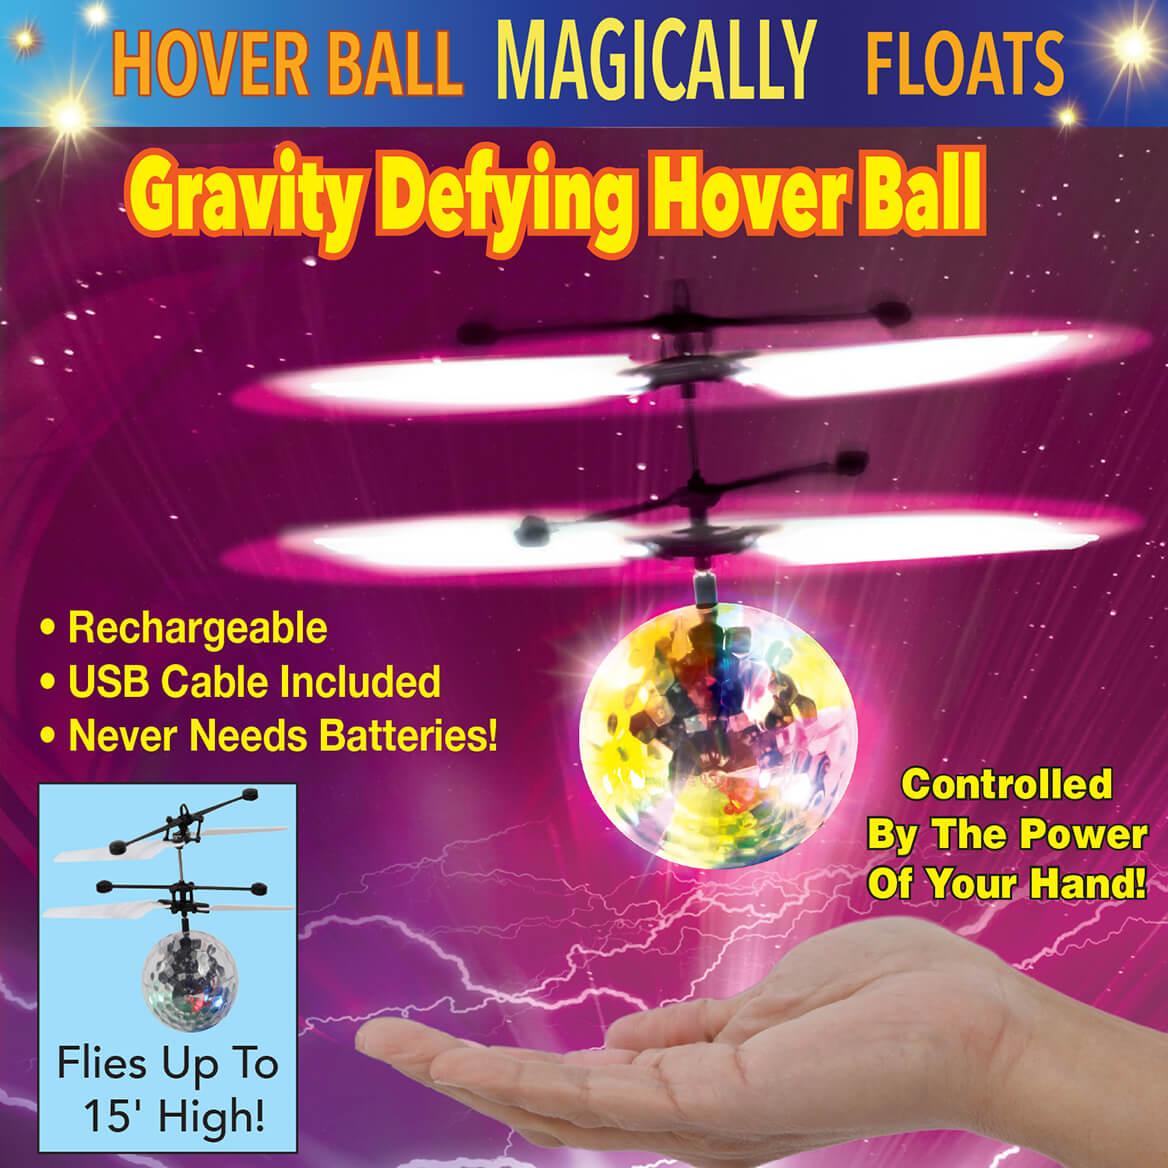 Gravity Defying Hover Ball-369865